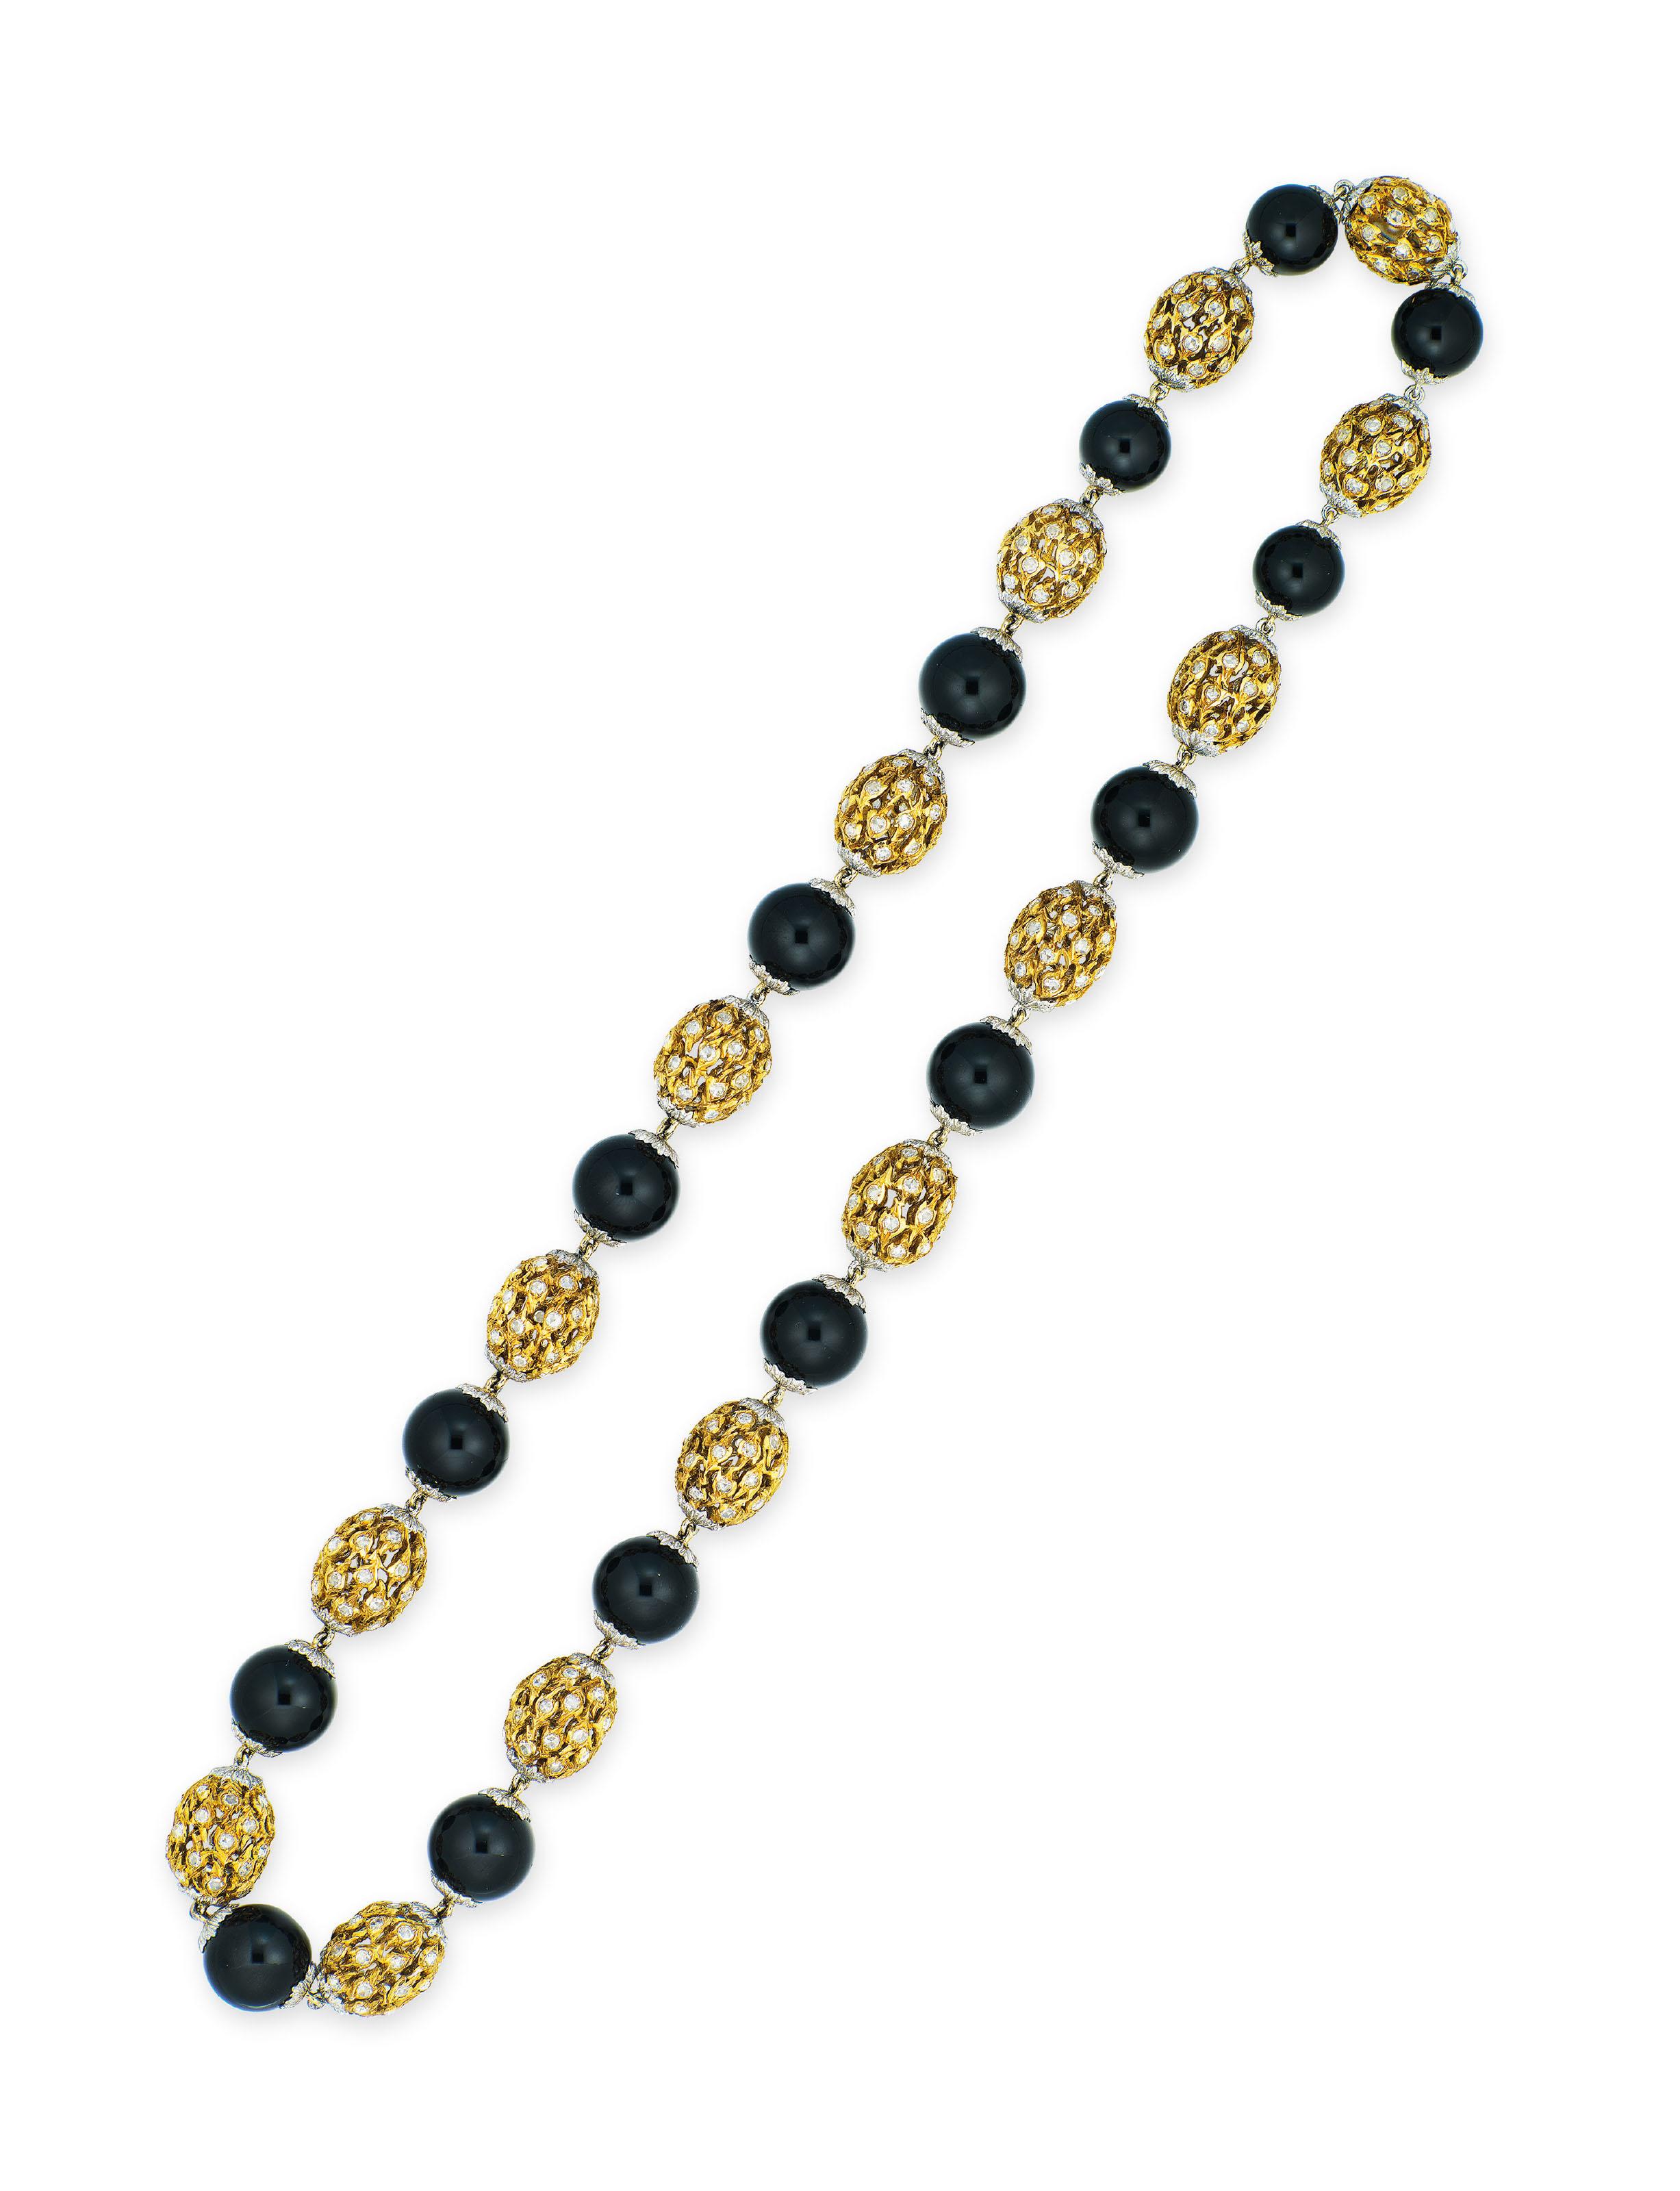 BLACK JADEITE BEAD AND DIAMOND NECKLACE, BUCCELLATI